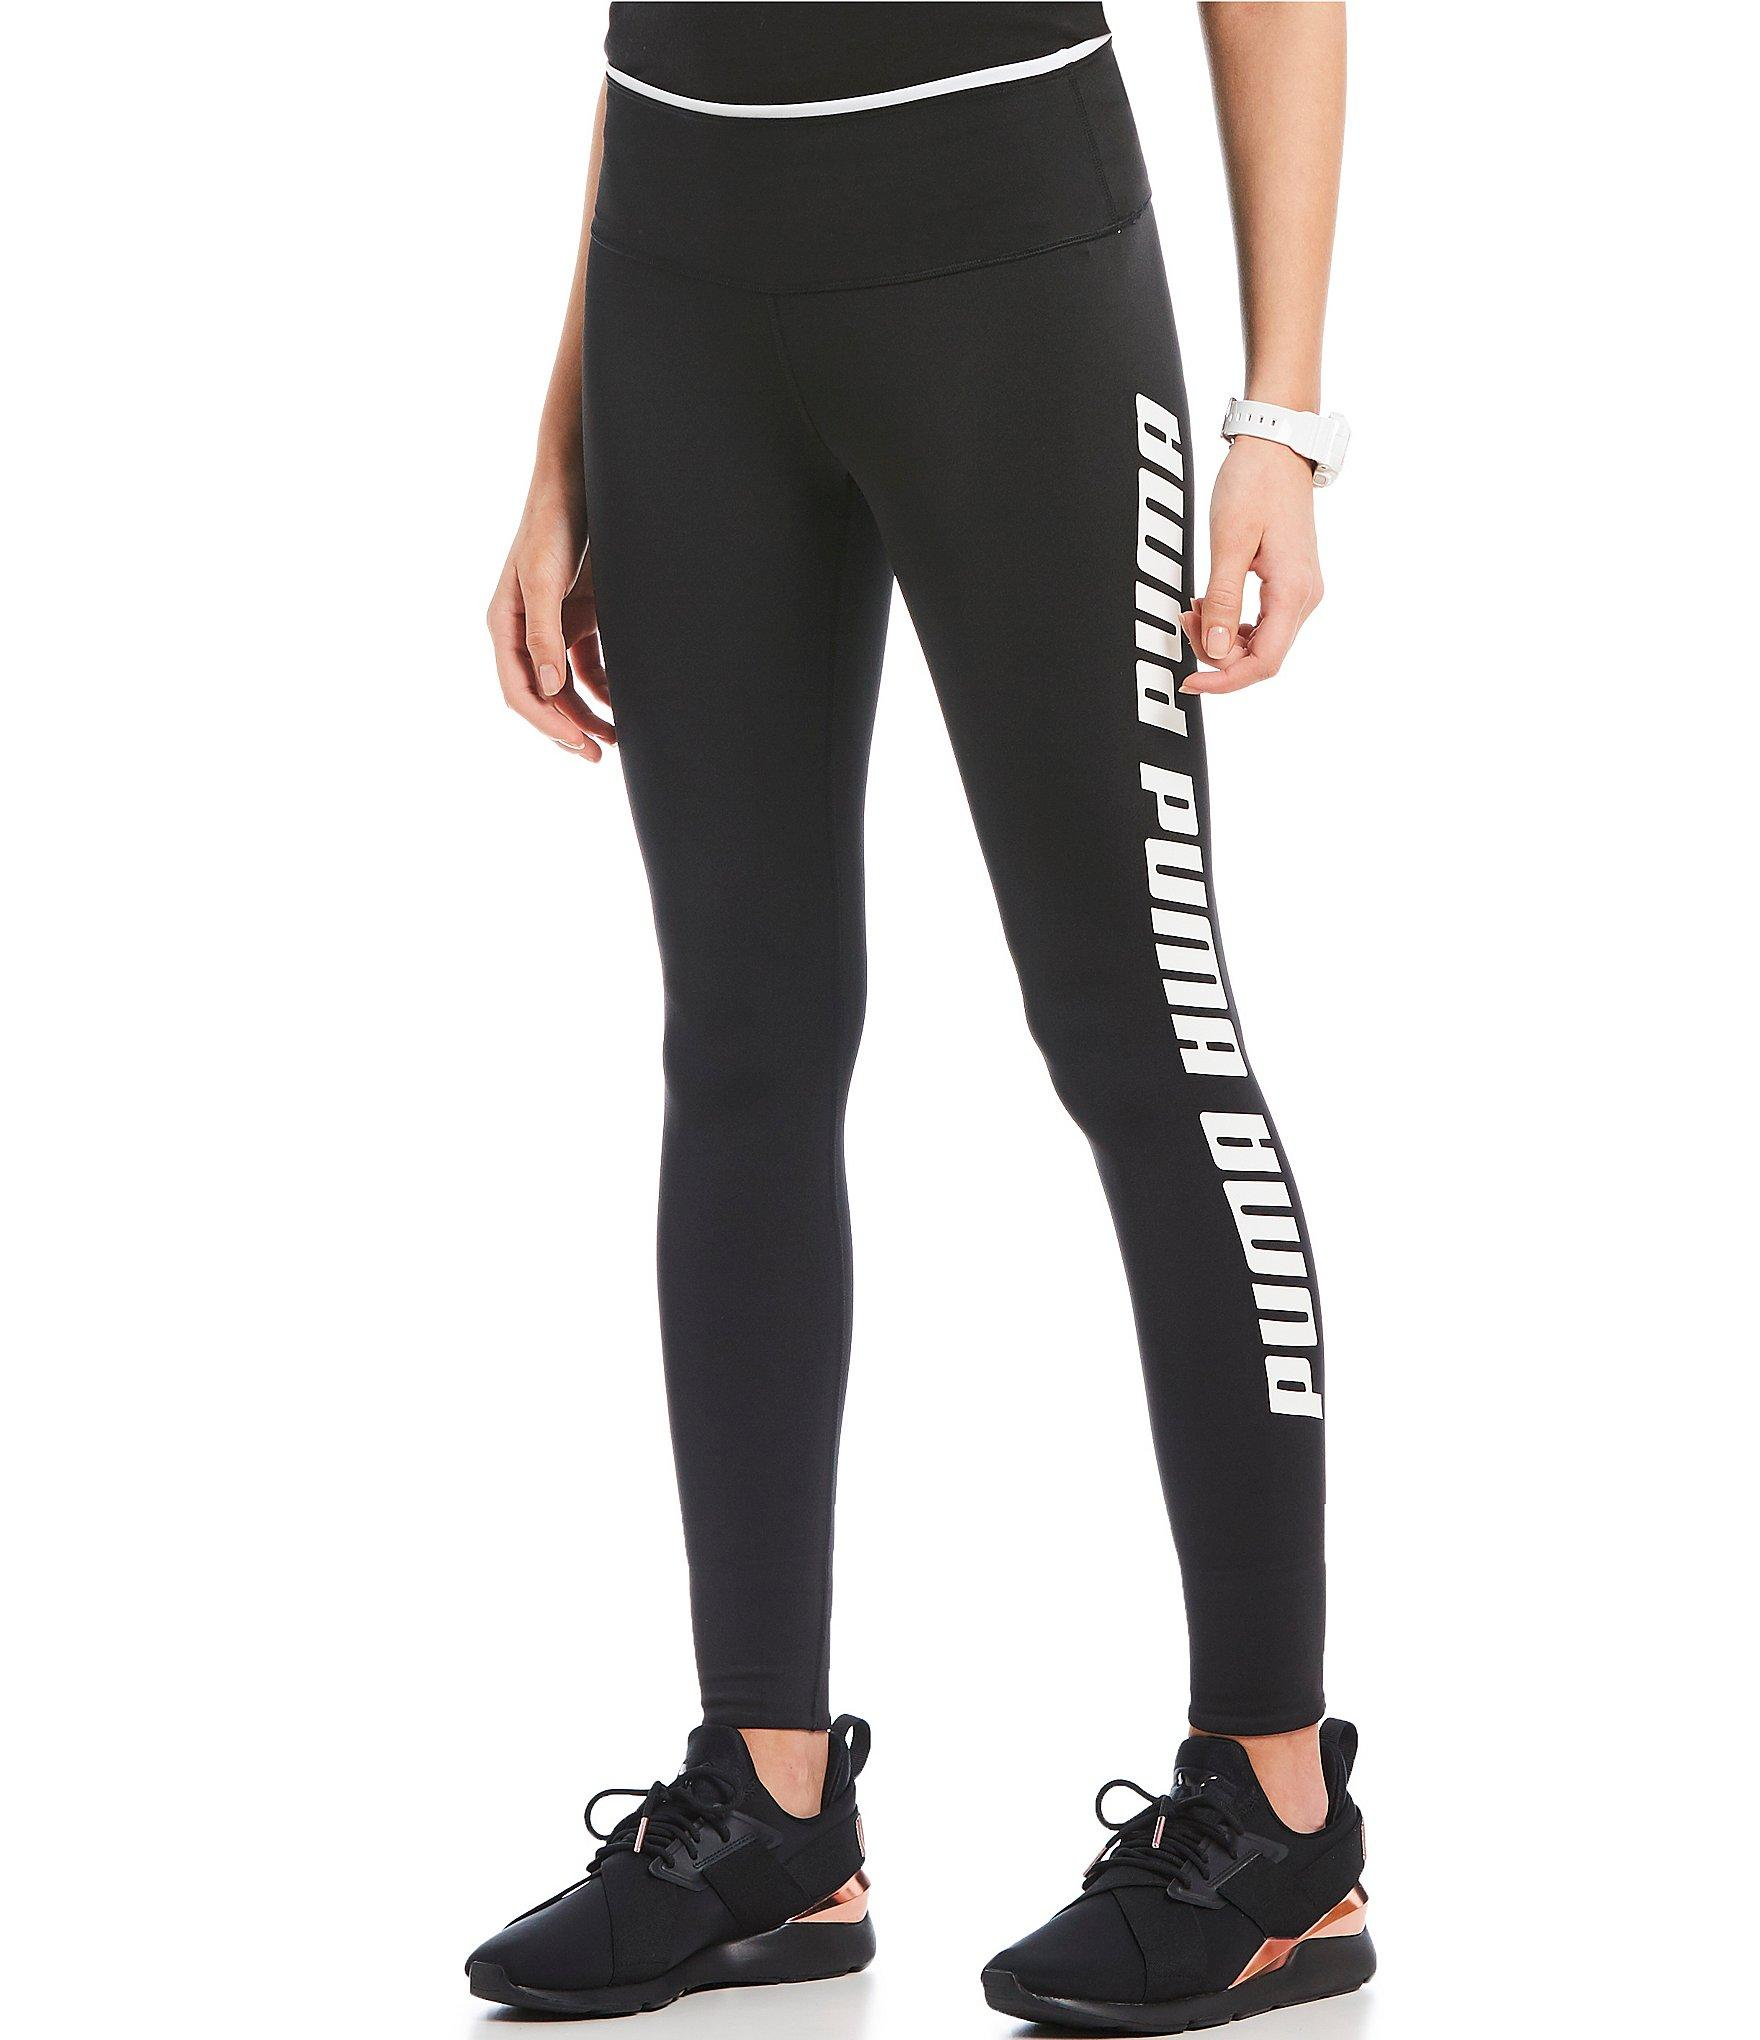 76858556c1904c PUMA - Black Modern Sports Fold Up Legging - Lyst. View fullscreen